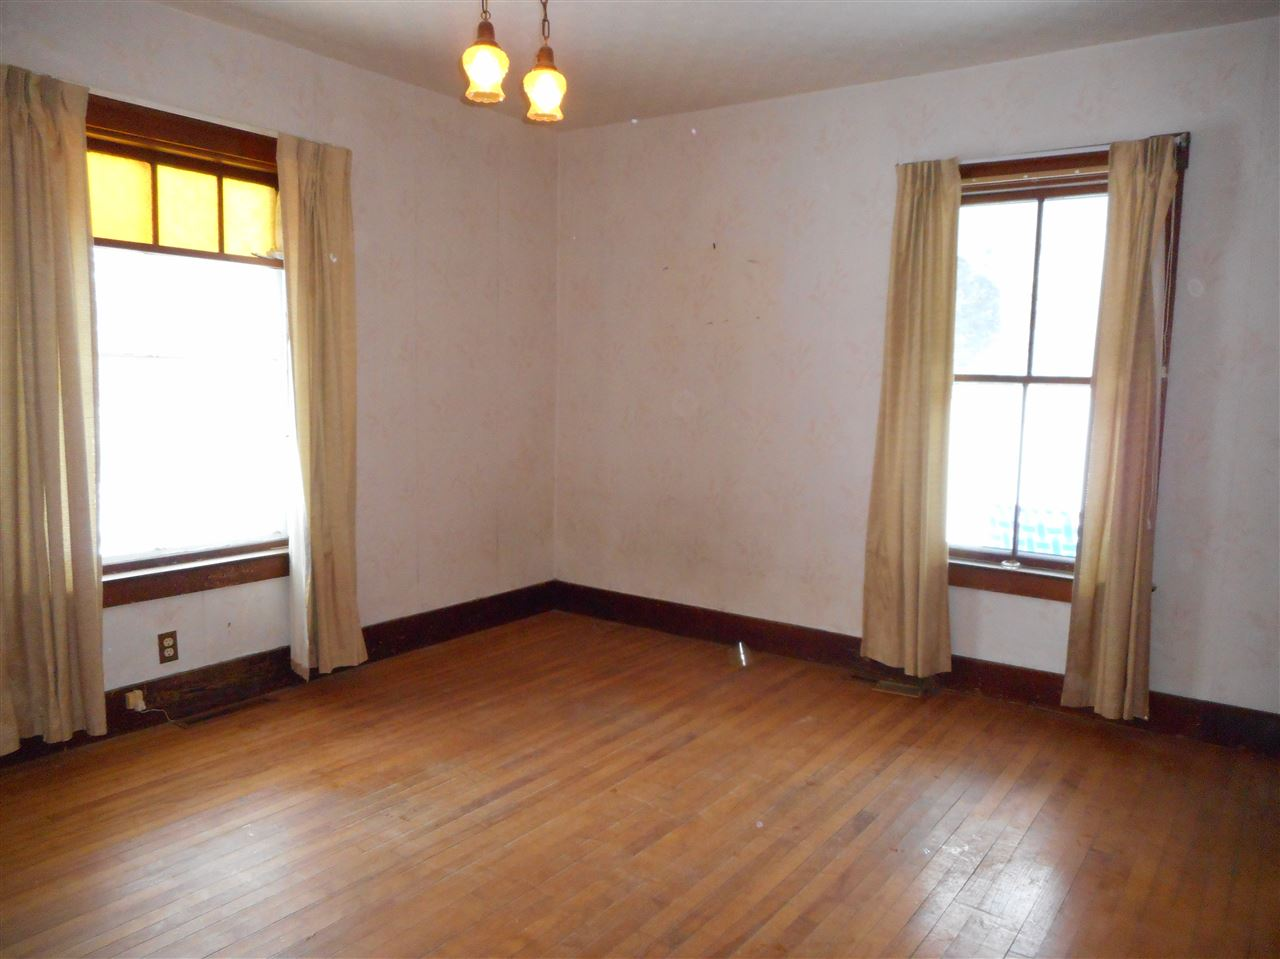 Vermont-Real-Estate-4622263-7